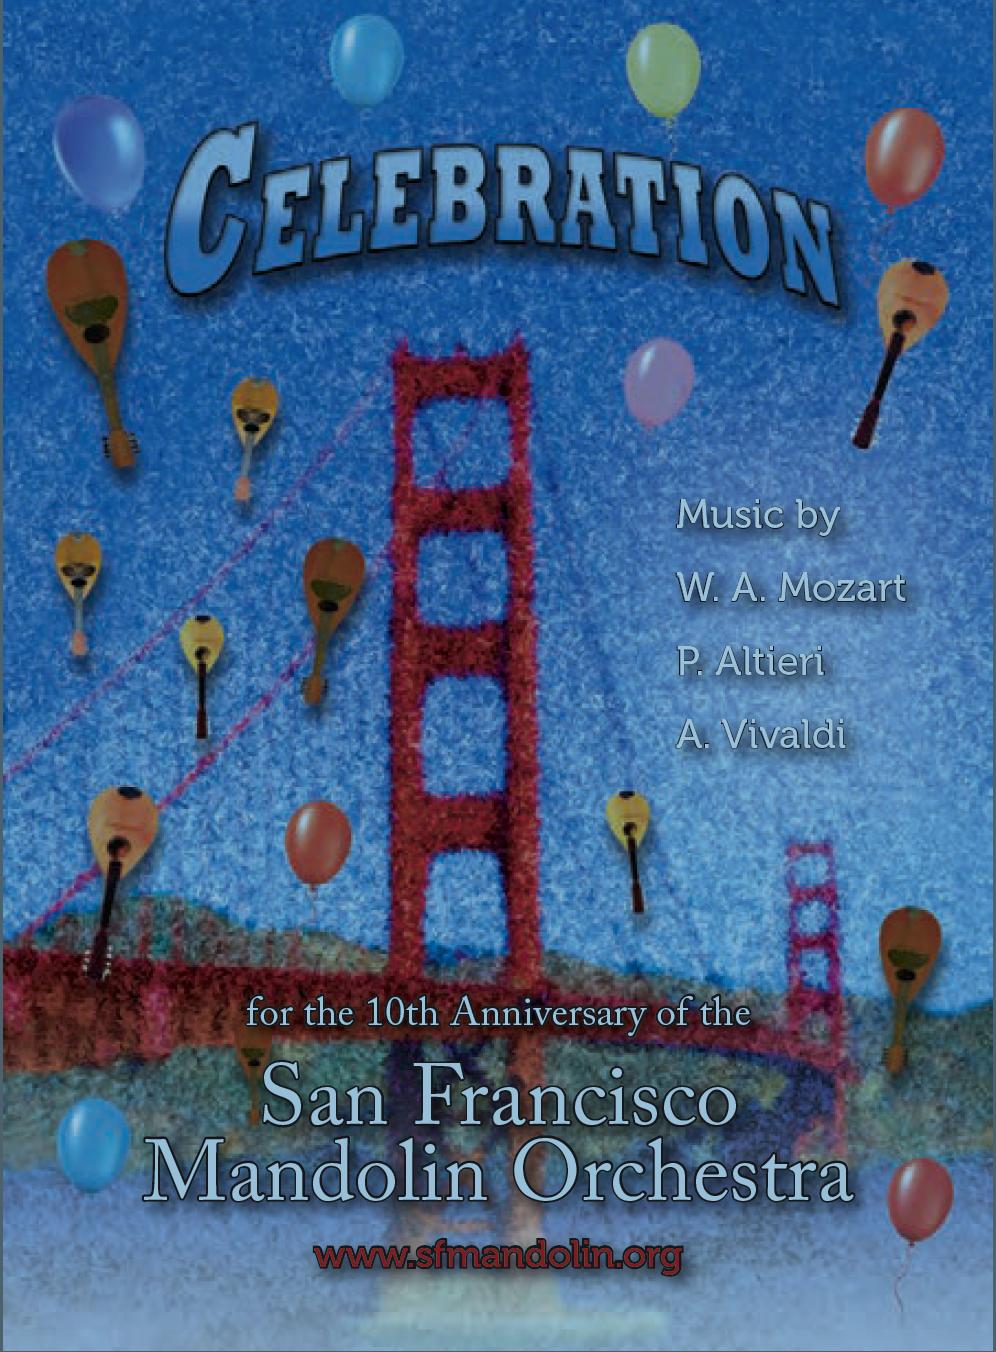 2015 Card for Celebration